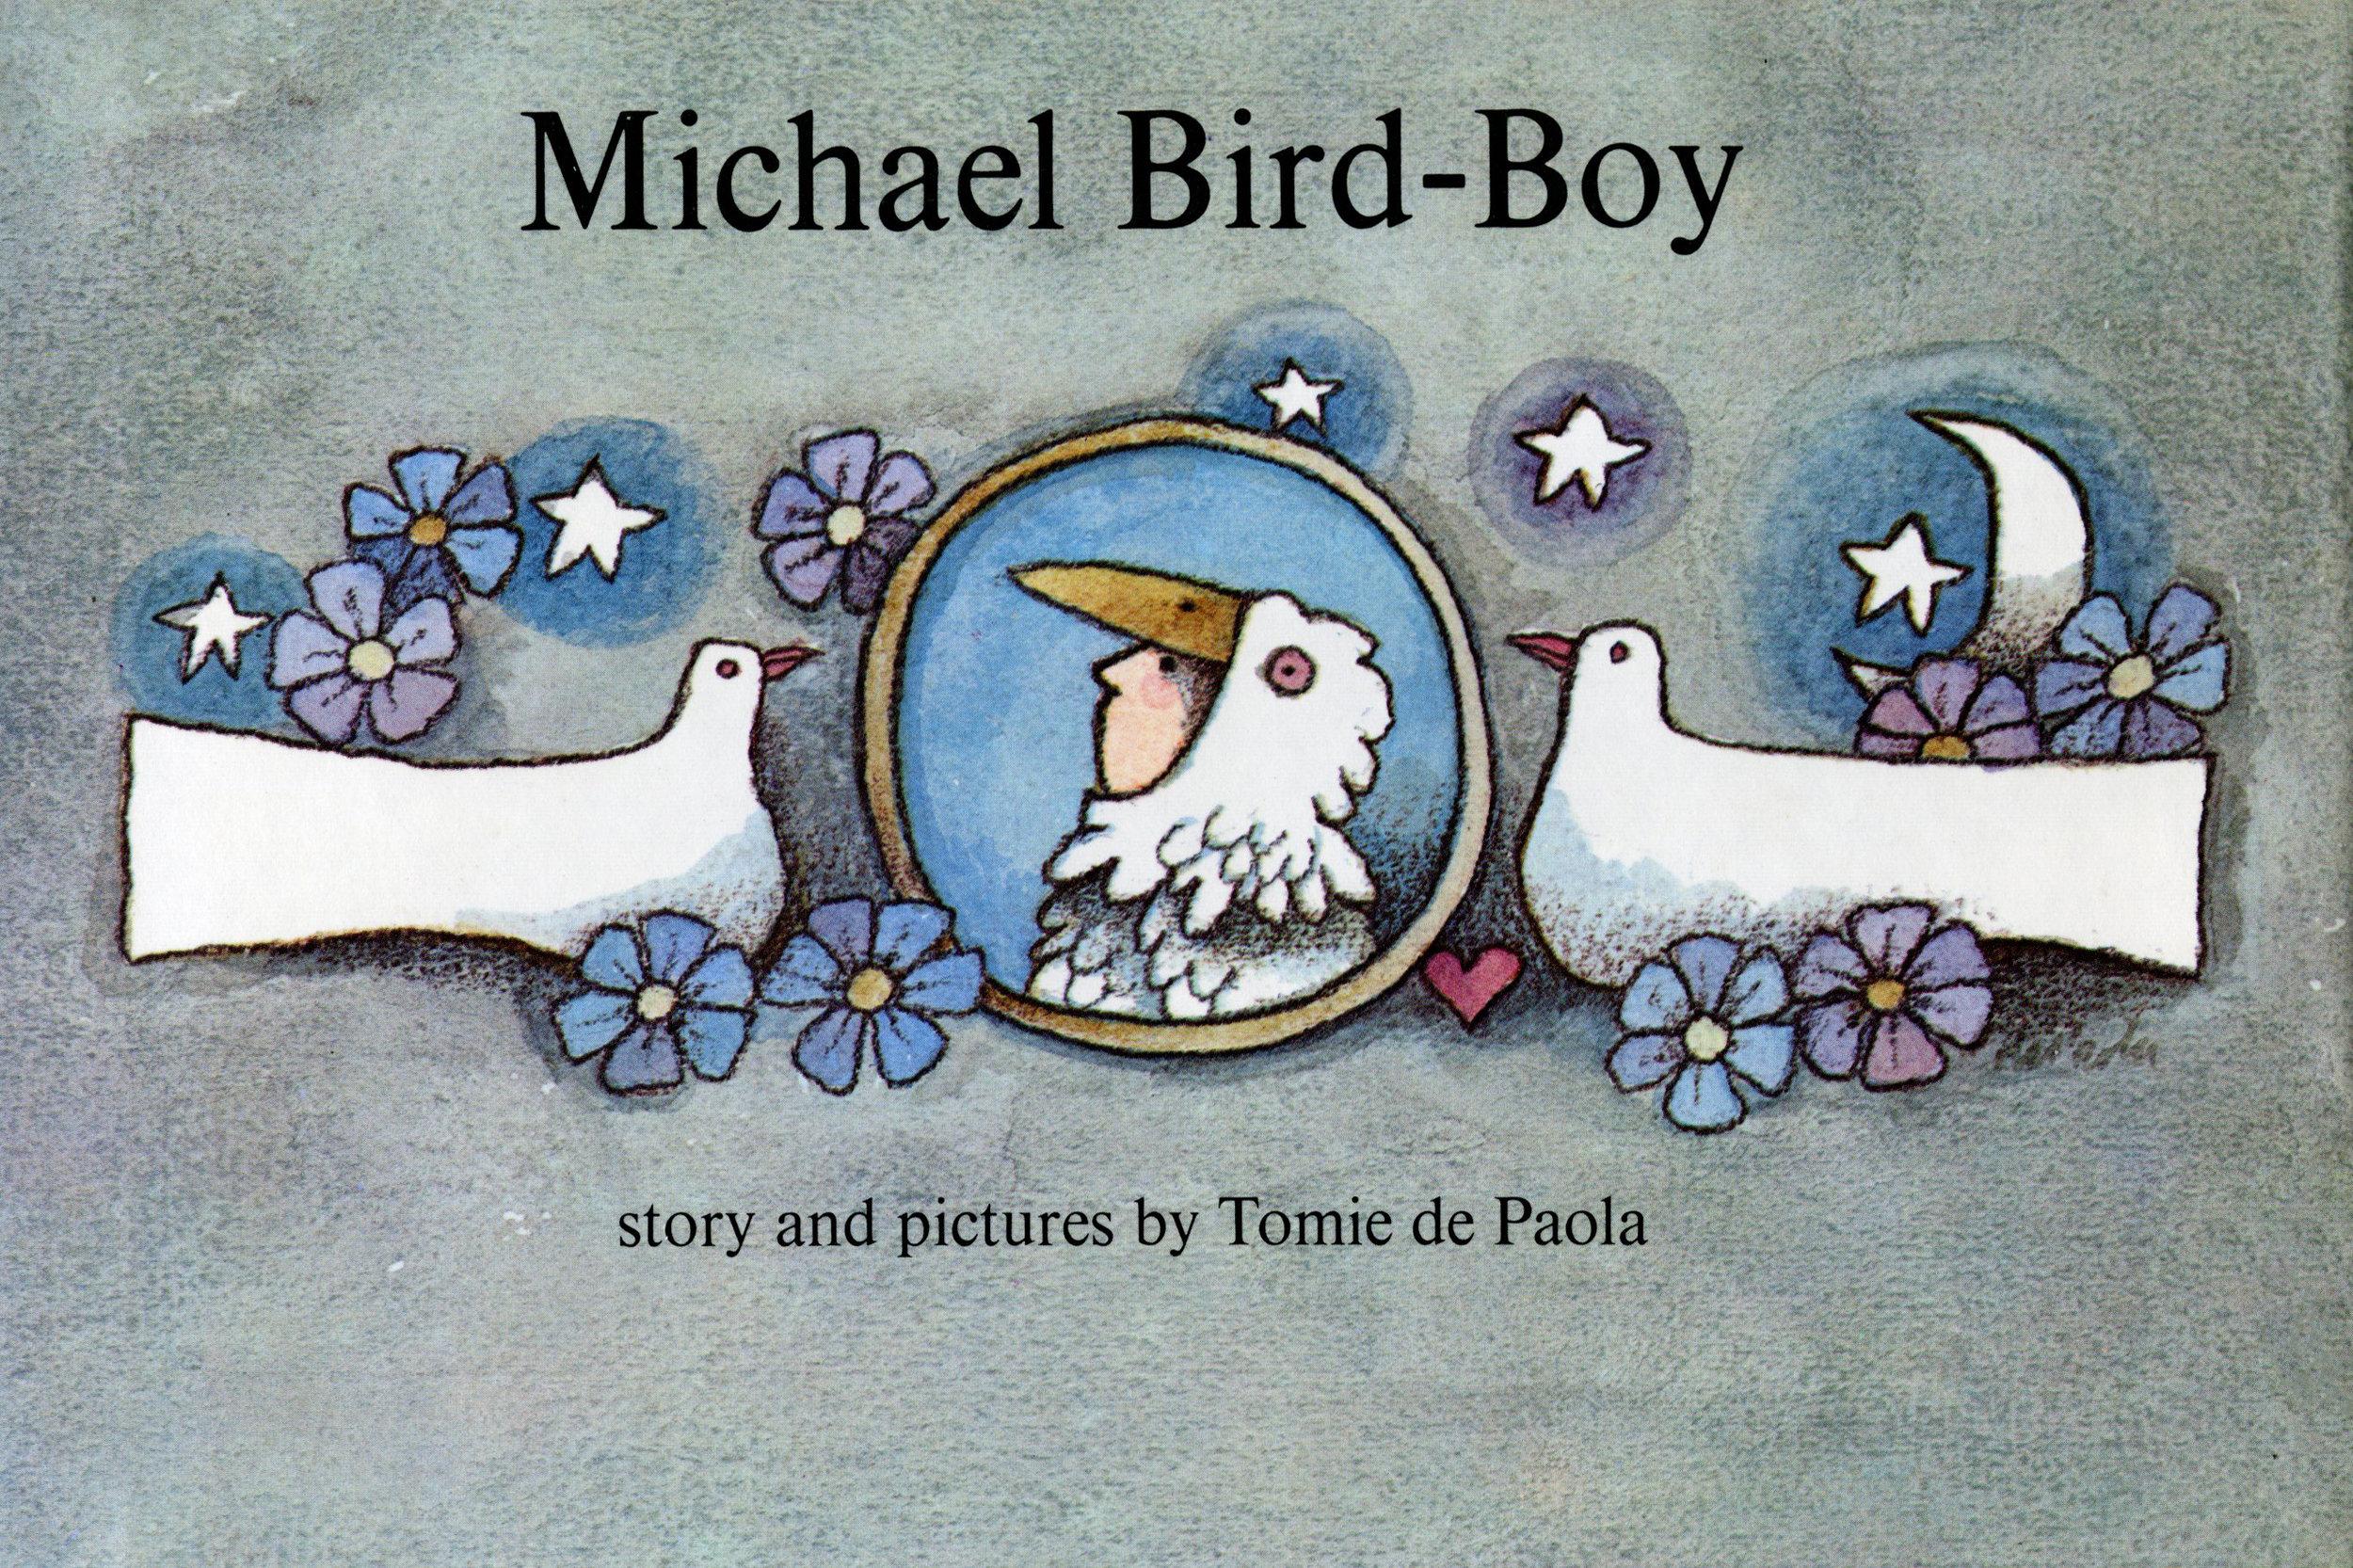 Michael Bird-Boy Cover.jpg